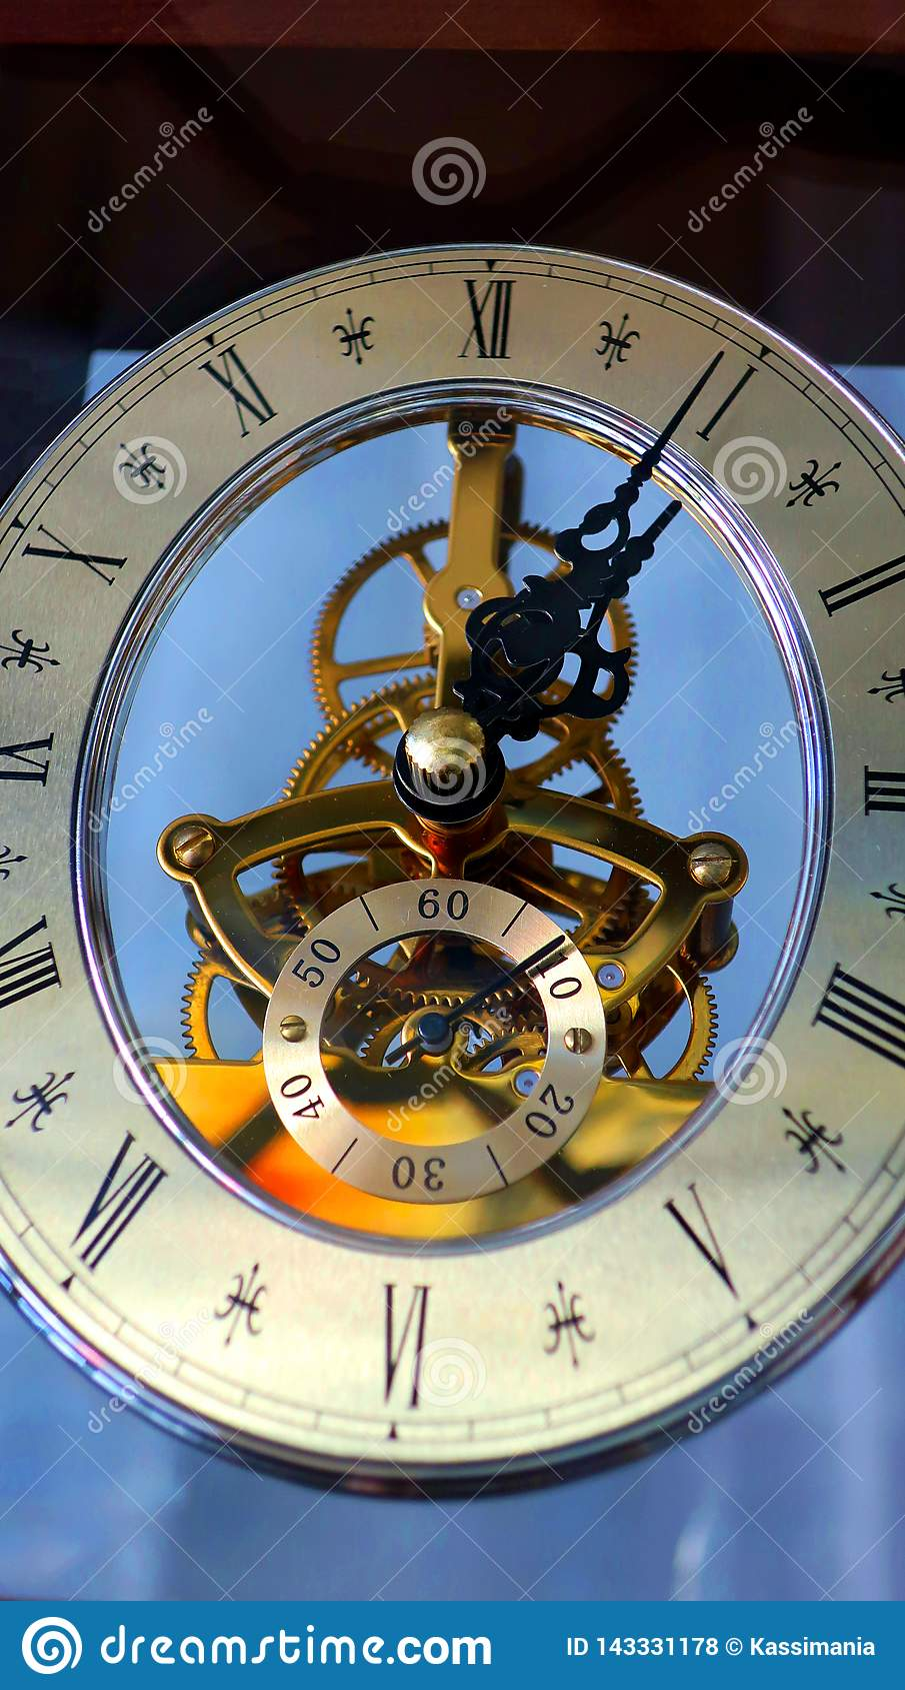 Old vintage wall blue clock